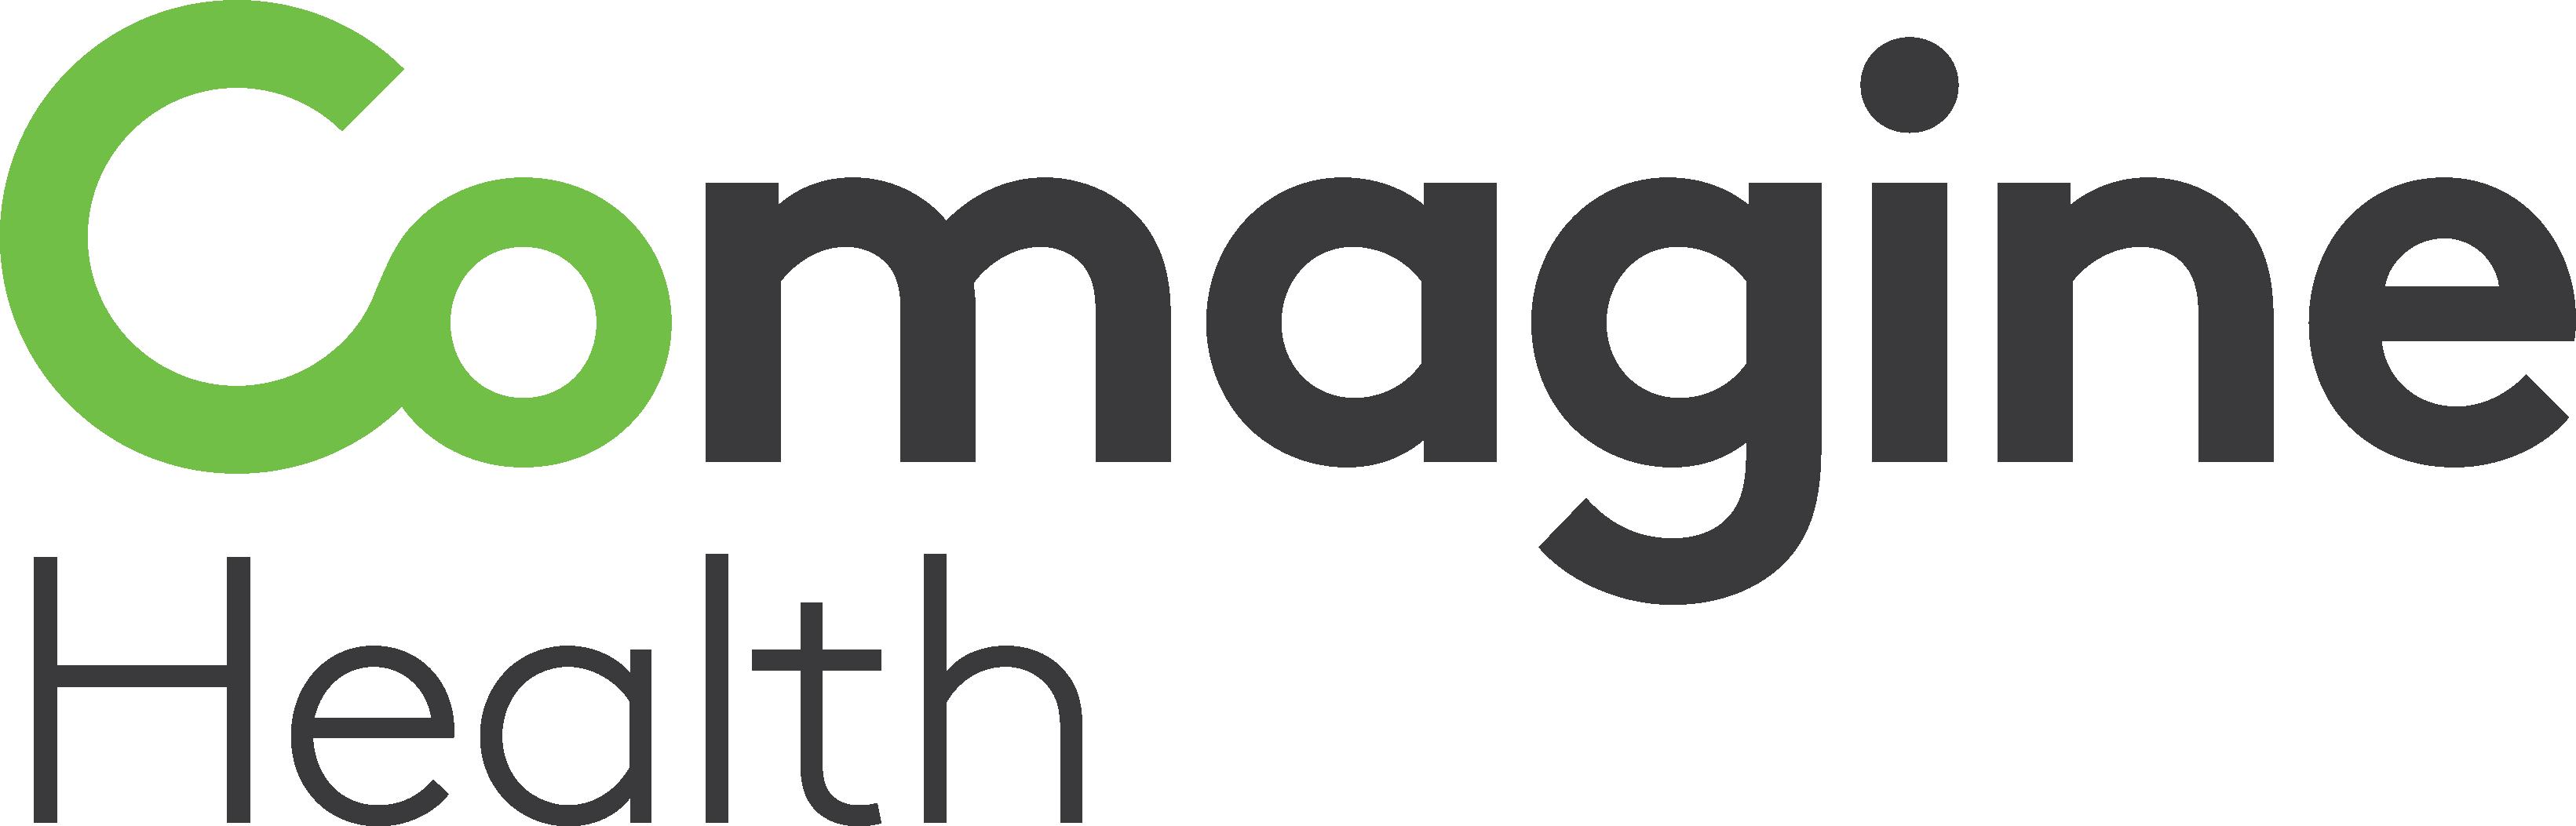 Comagine Logo.png